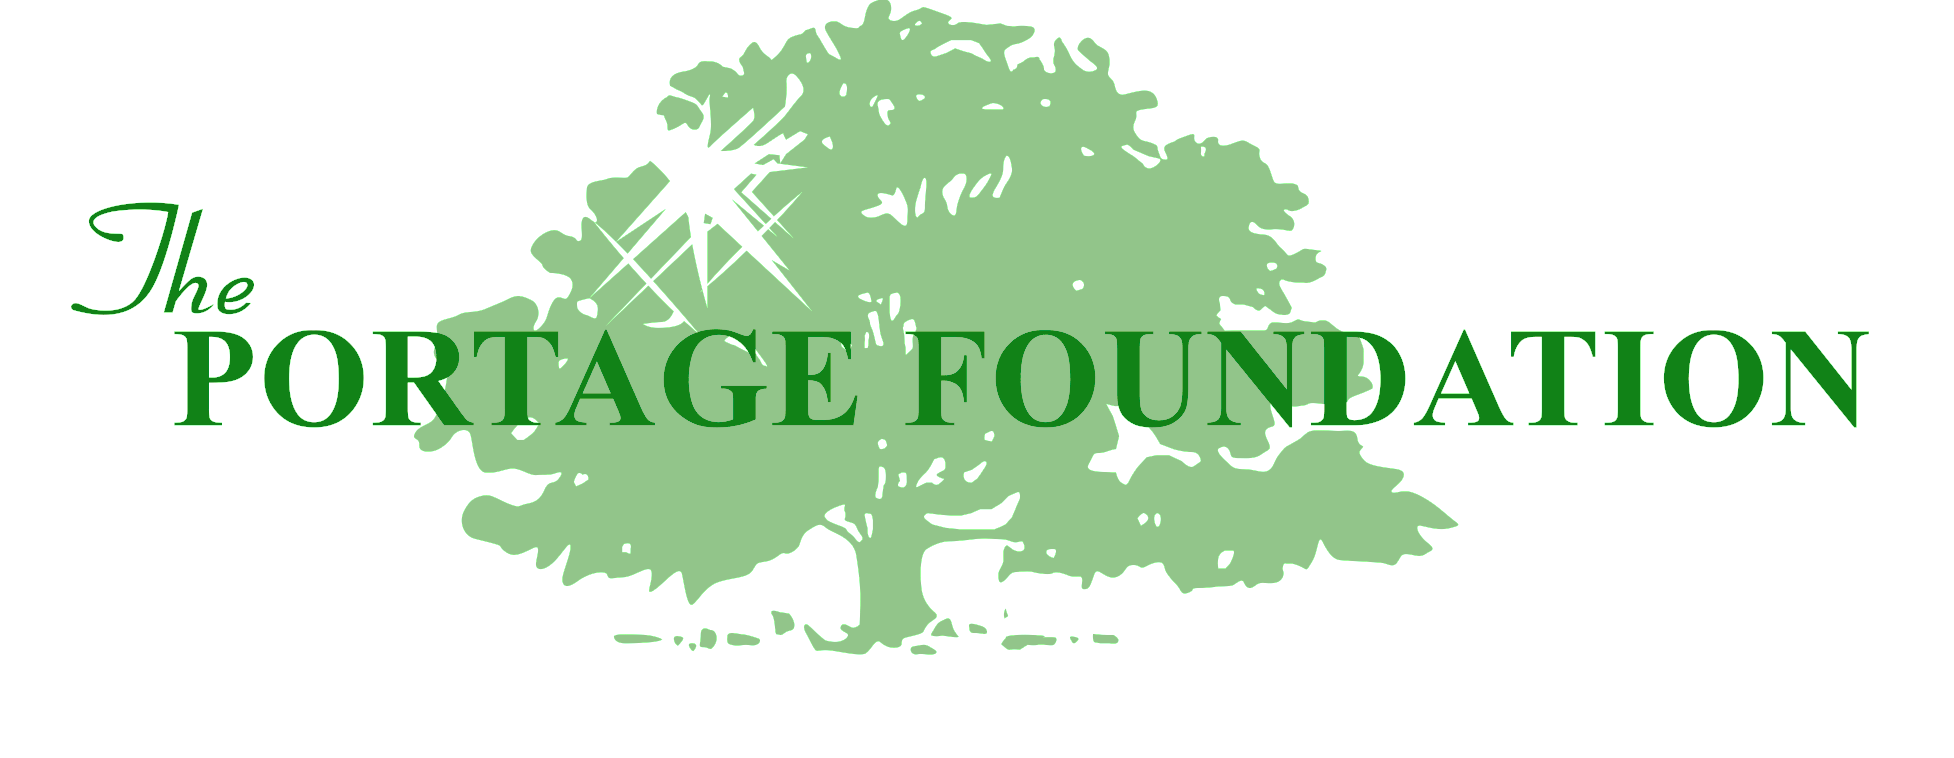 portage foundation.png